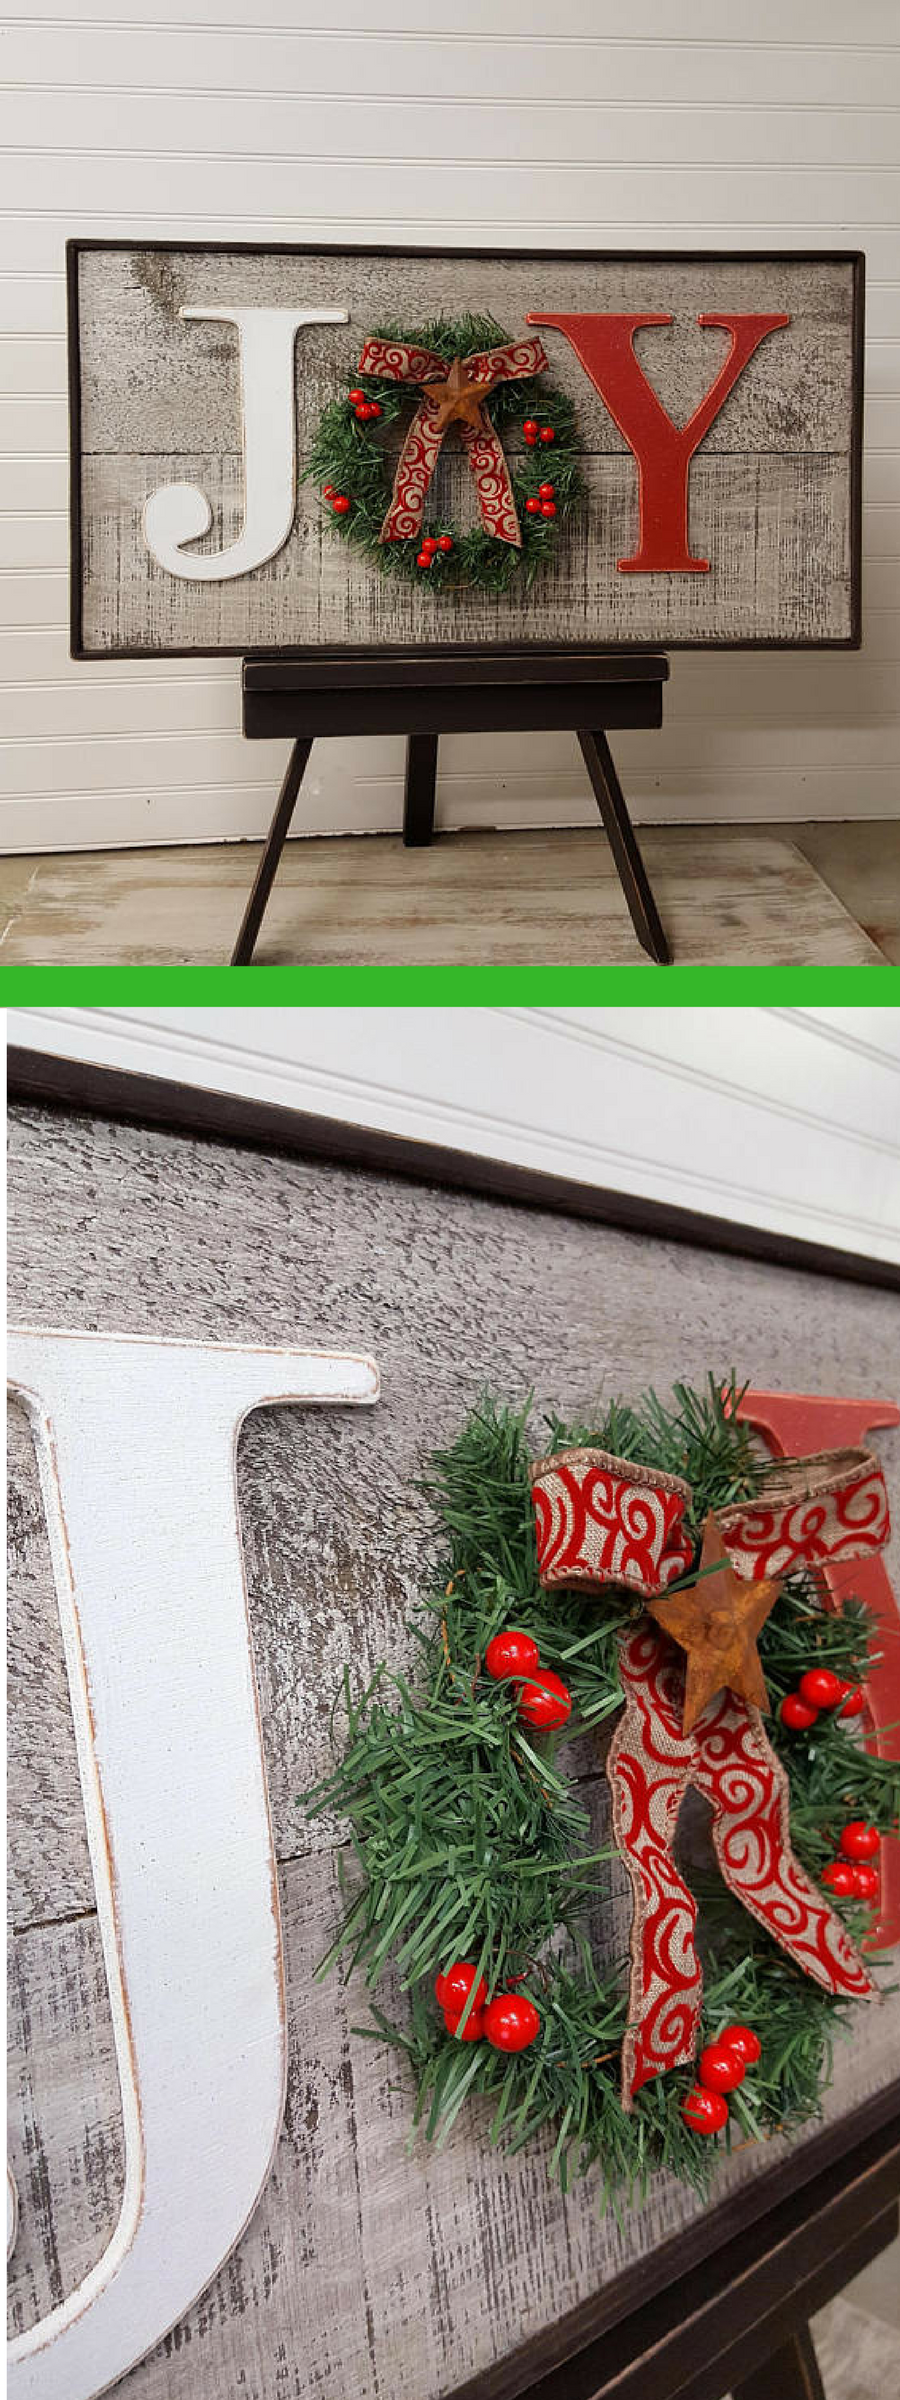 Photo of Rustic Joy sign, Country Christmas decor, Christmas mantle decor, Farmhouse Chri…